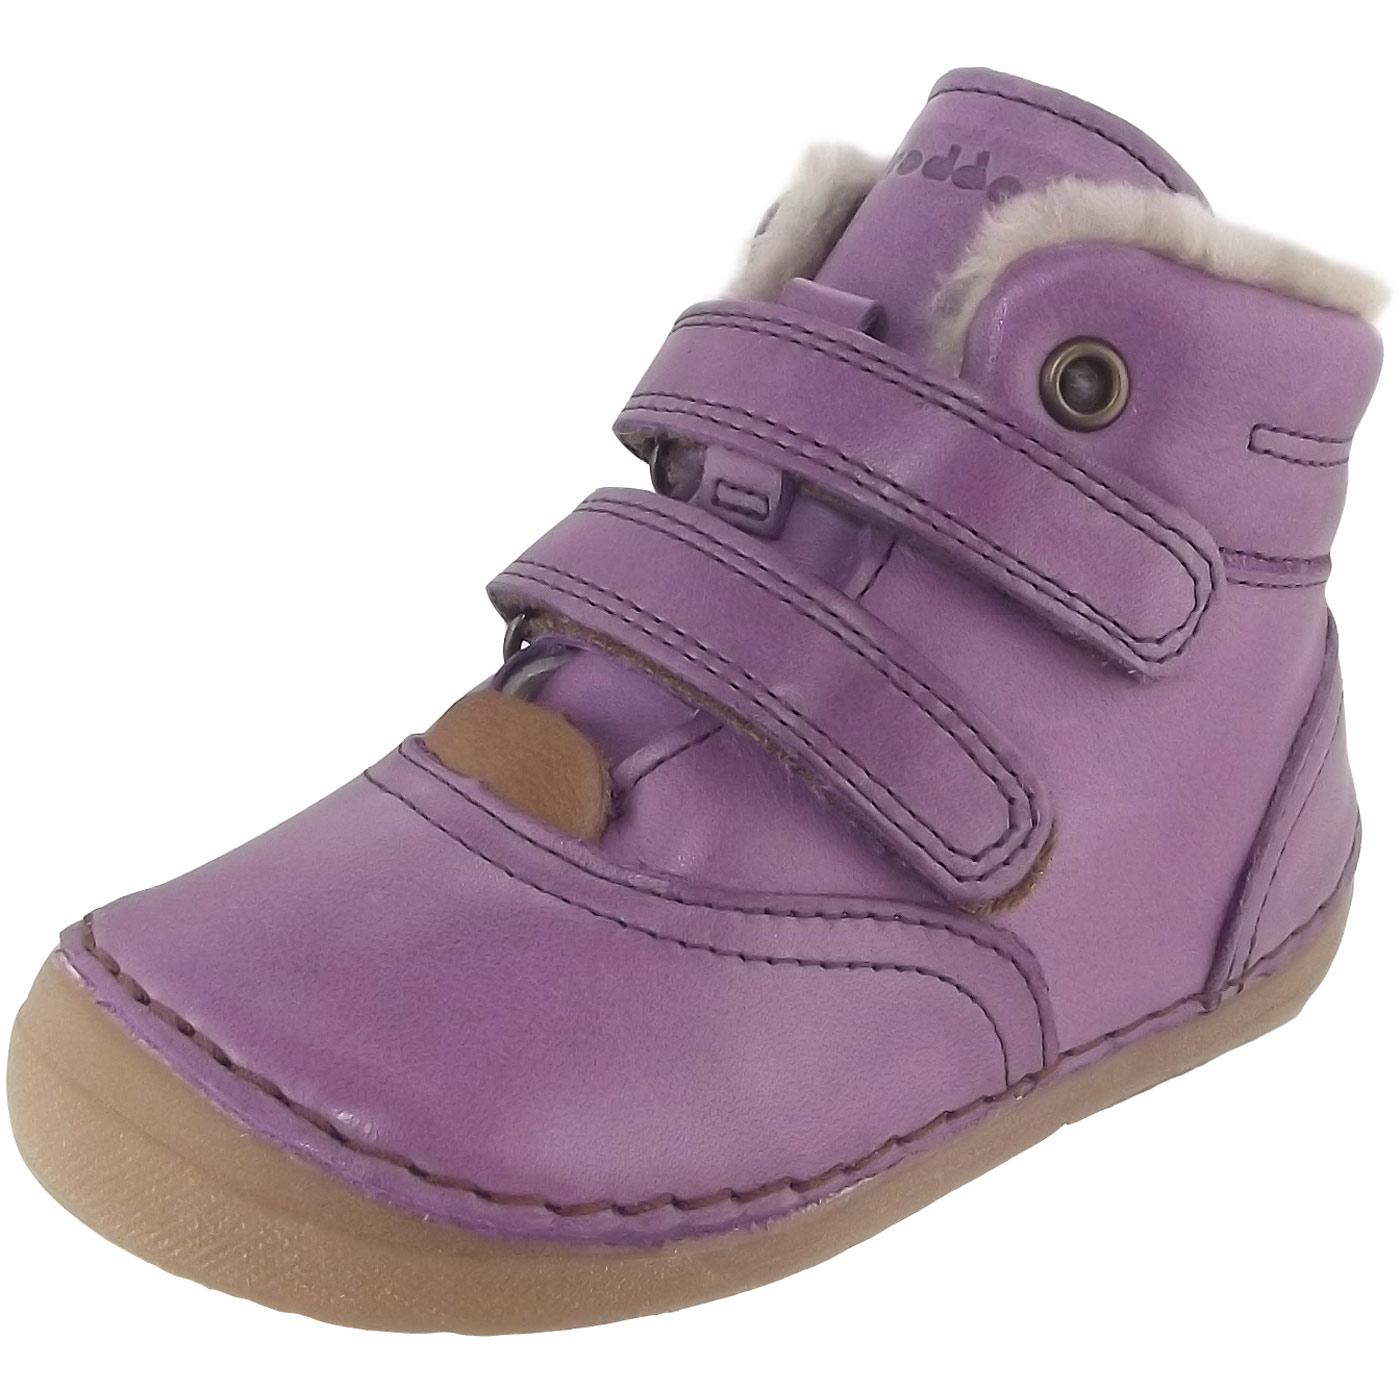 new concept efb40 c66be Froddo G2110058 Sheepskin Girl First Walker Boots purple